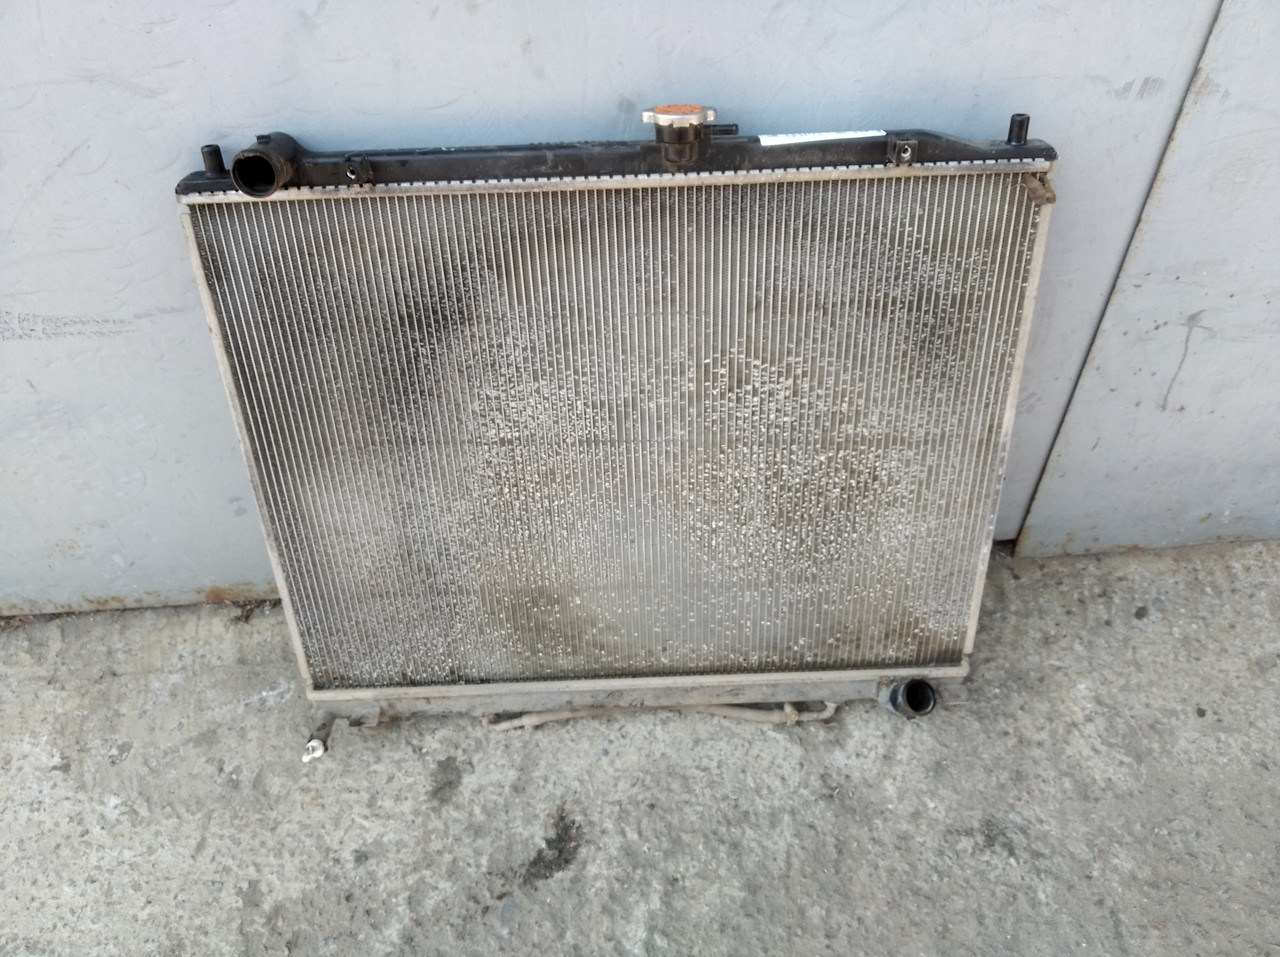 Радиатор охлаждения двигателя MN135949 57084 Pajero Wagon 4 Mitsubishi